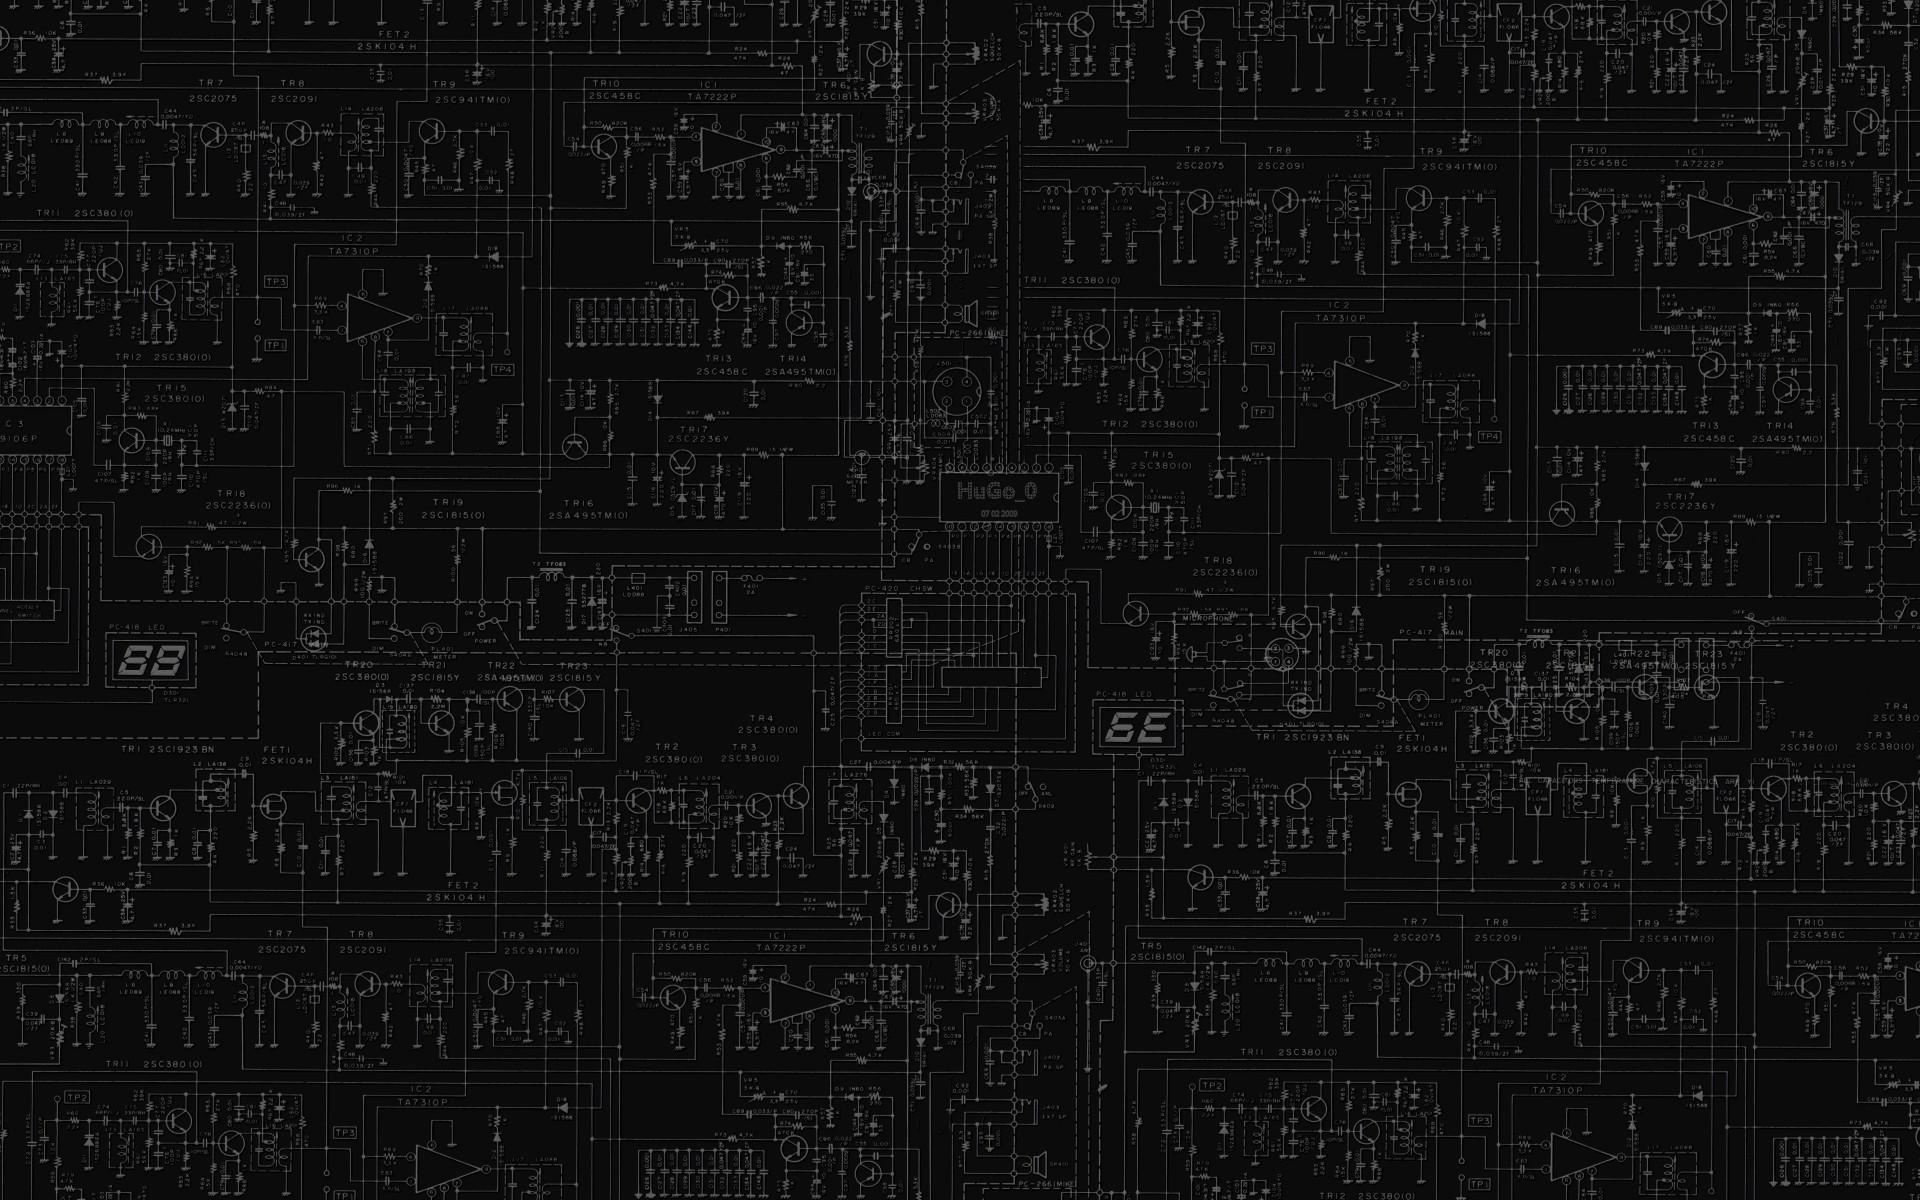 Schematic Circuits Diagram Black Bw Wallpaper